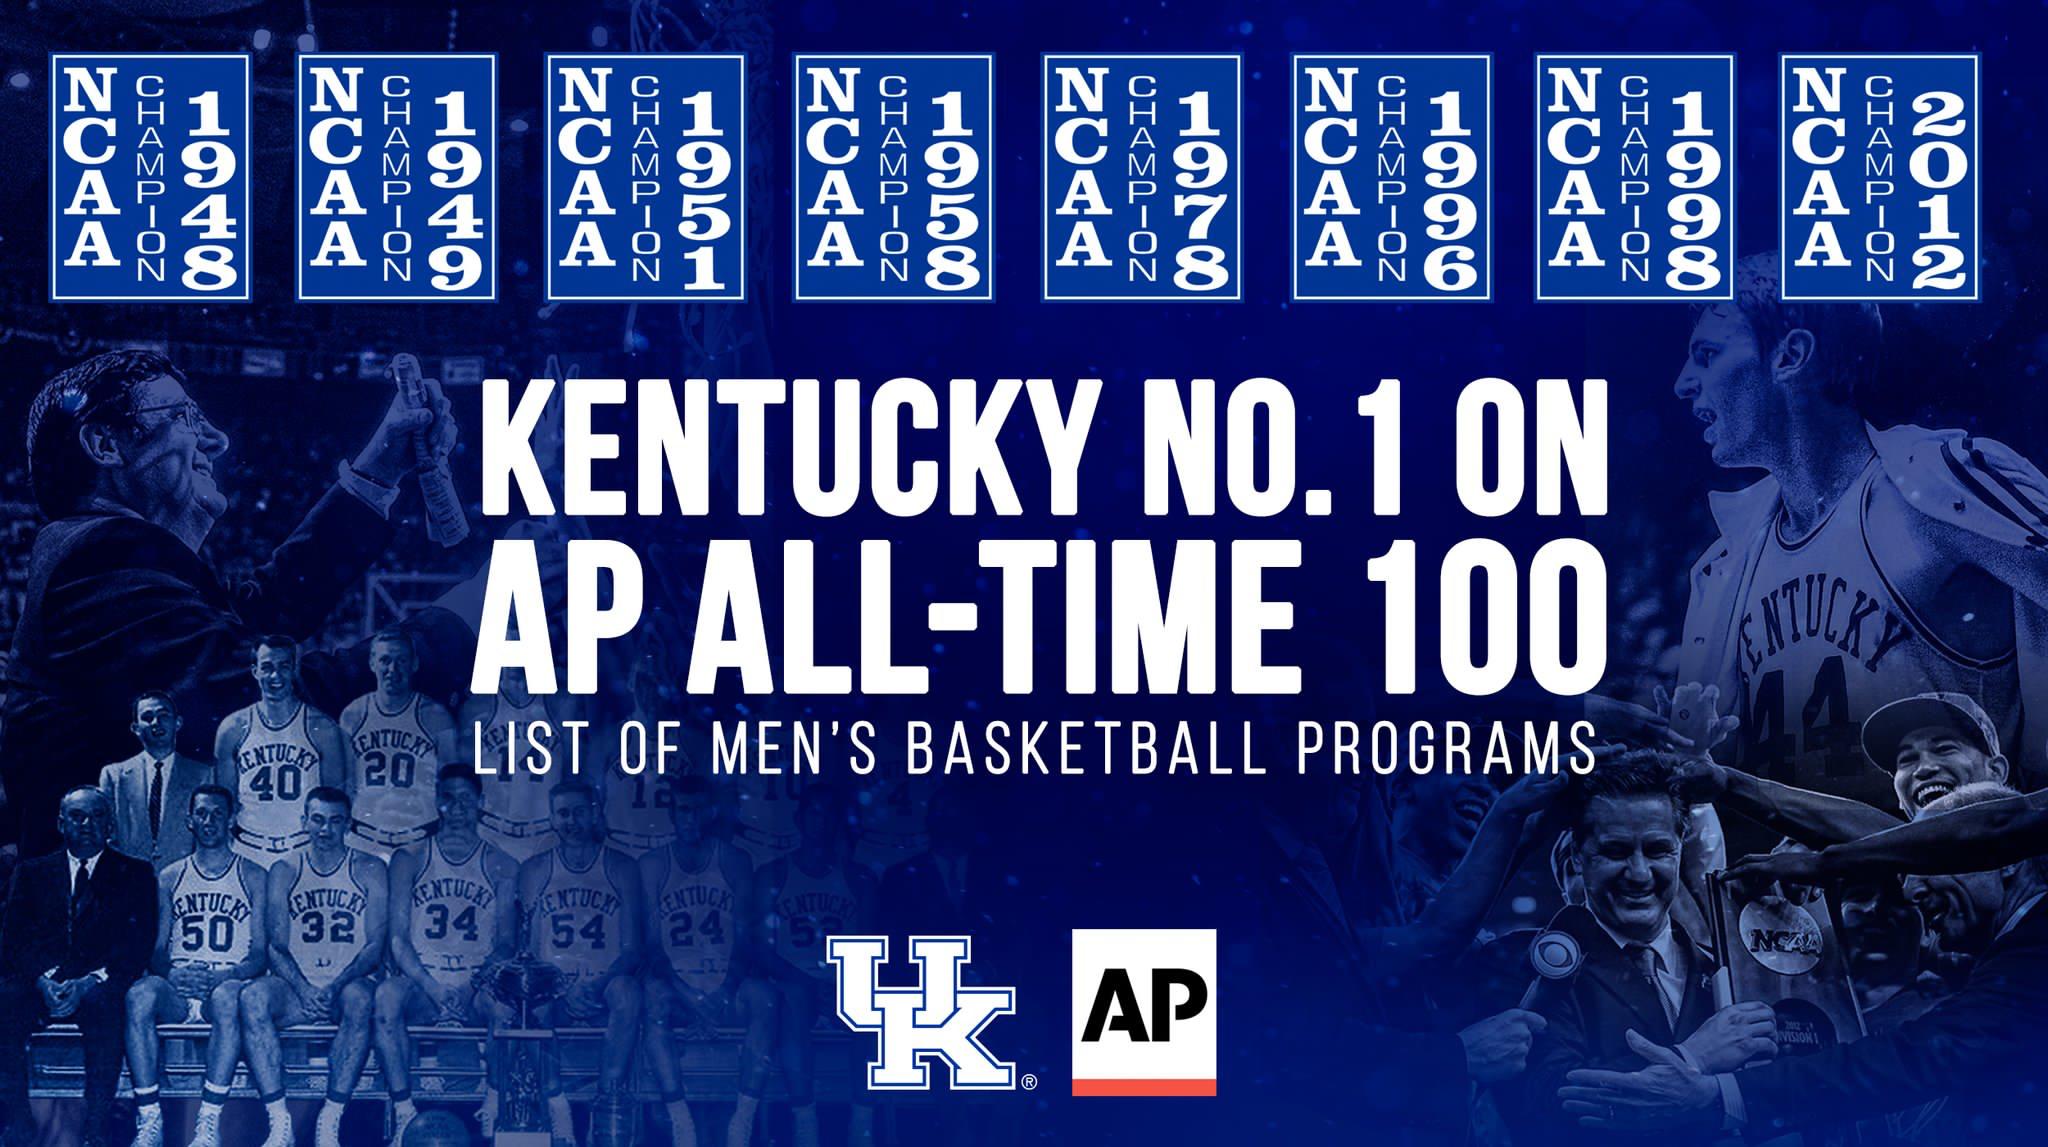 Kentucky   Kentucky, Basketball program, University of ky